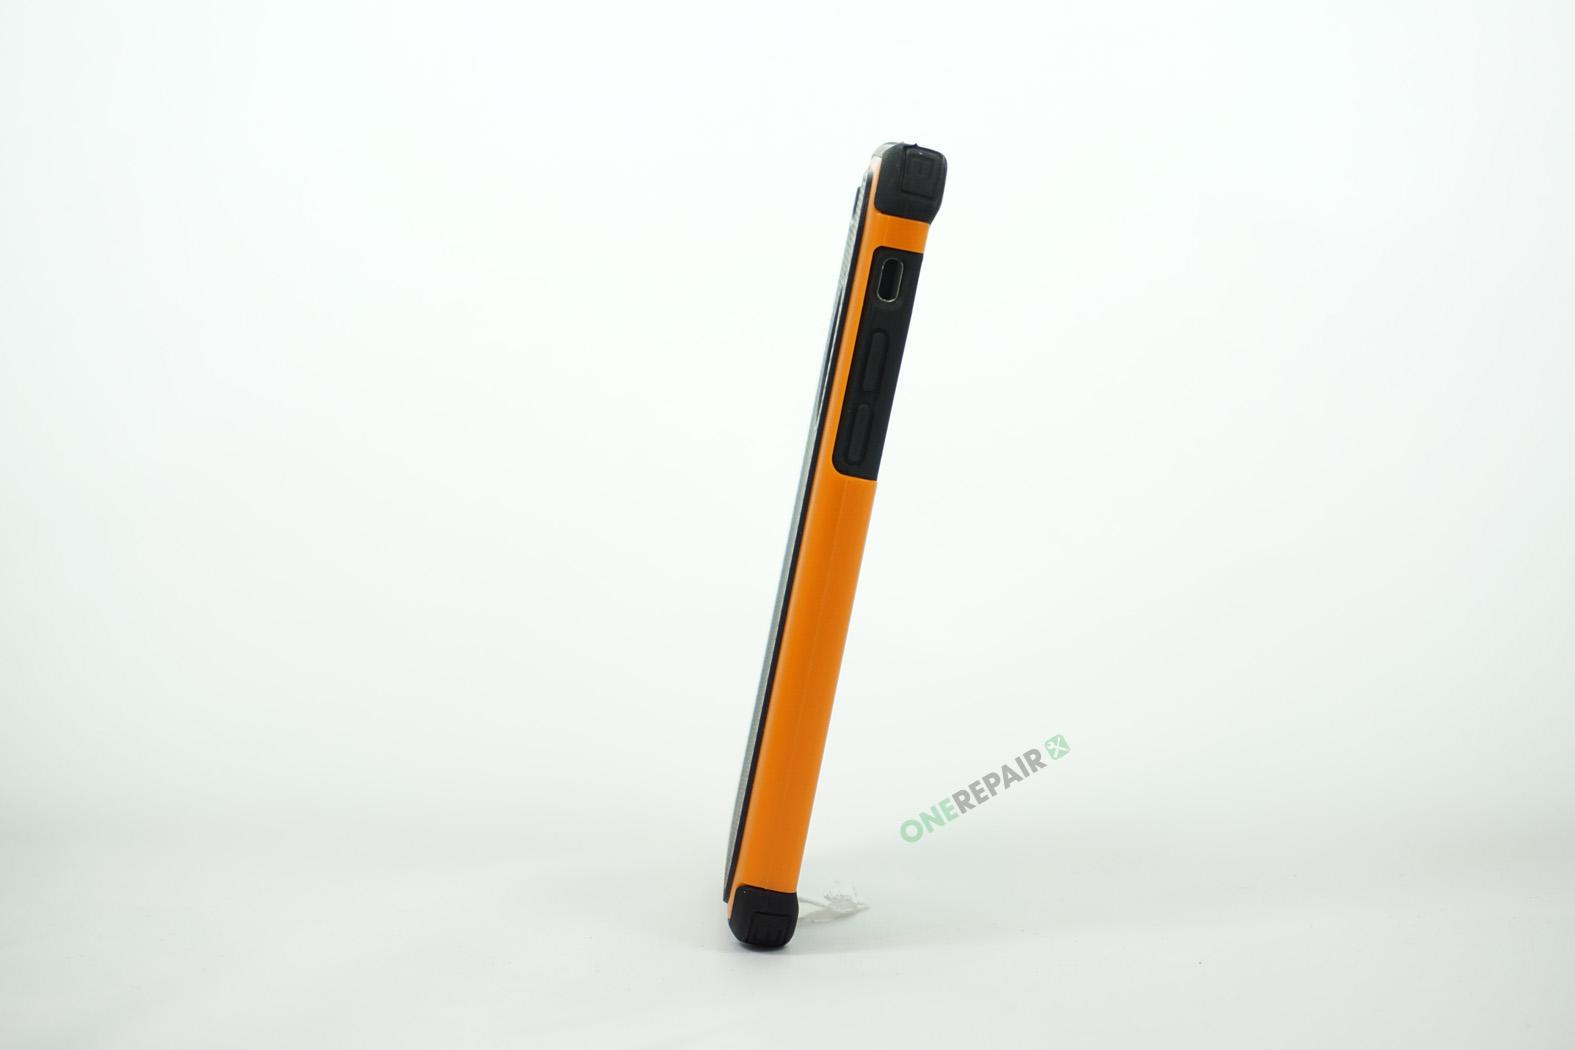 350526_iPhone_6_6S_Haandvaerkercover_Hardcase_Cover_Orange_OneRepair_00002